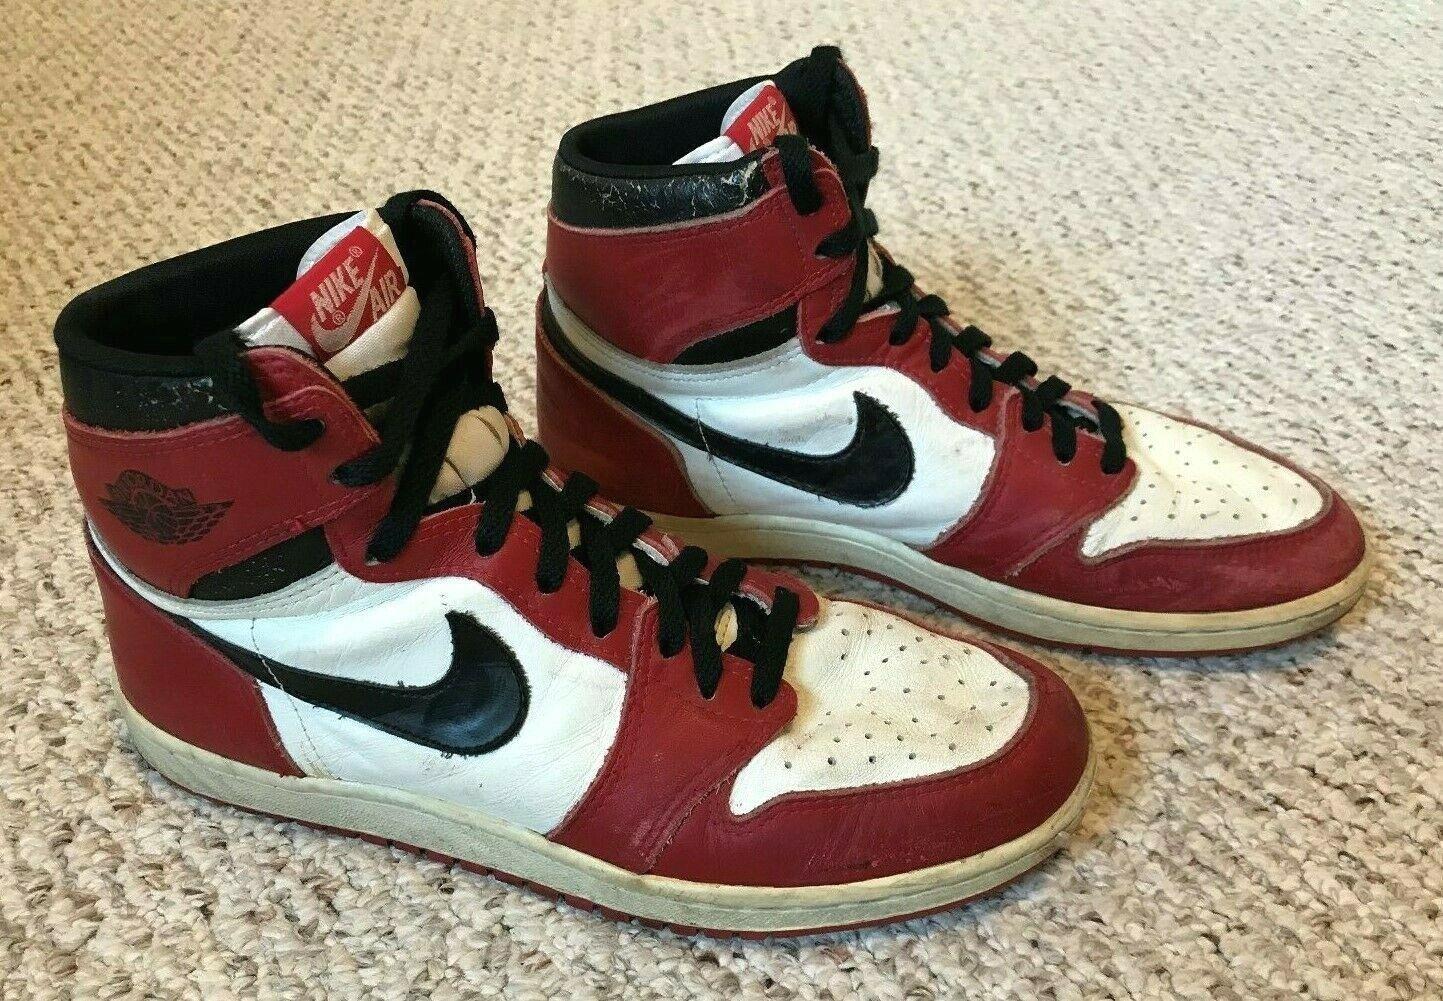 Original Nike Air Jordan 1 (1985) Sz 10.5